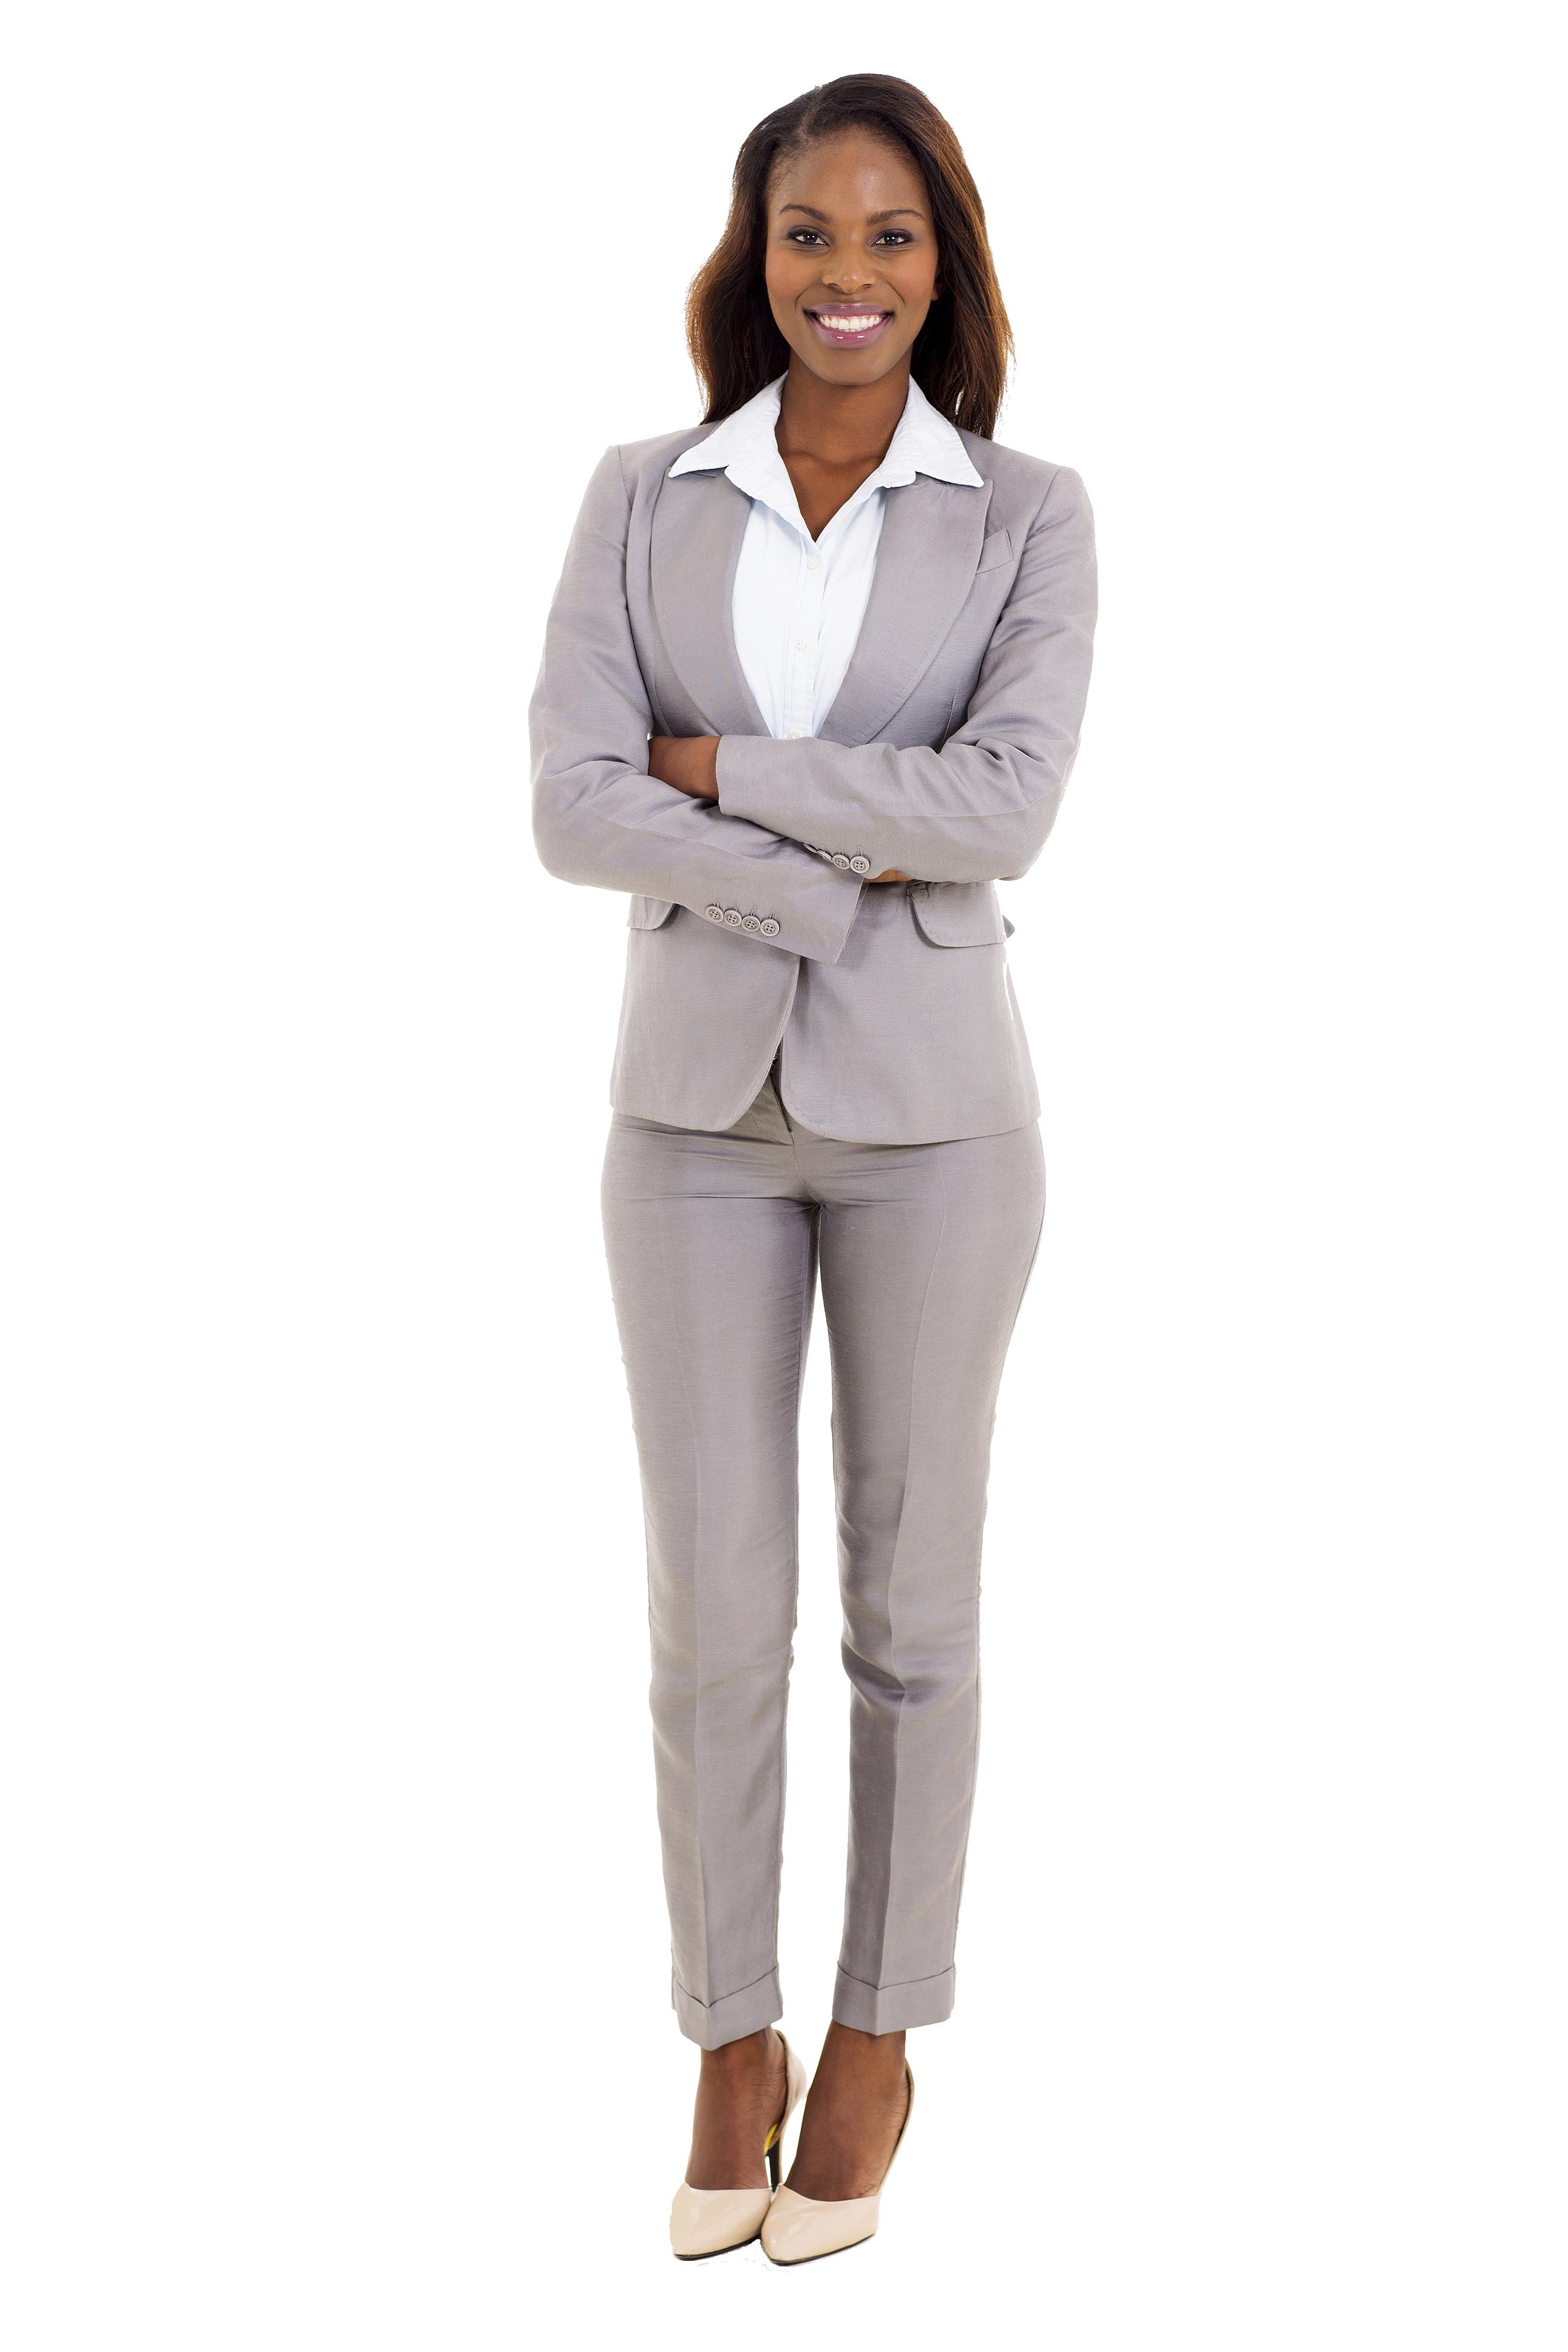 business suit for women photo - 1